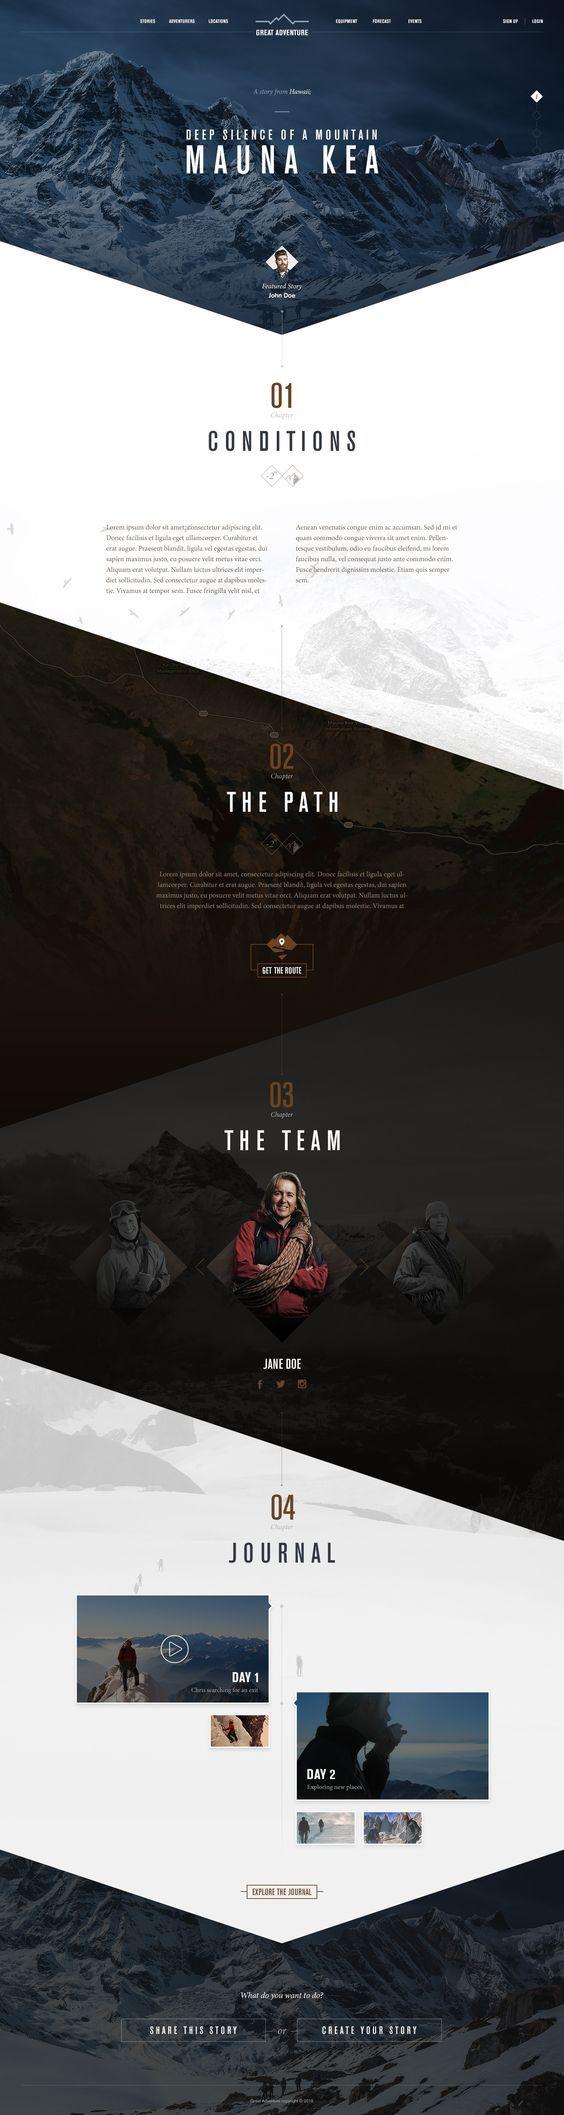 Great Adventure Web Design by Tansel Turunz | Fivestar Branding – Design and Branding Agency & Inspiration Gallery